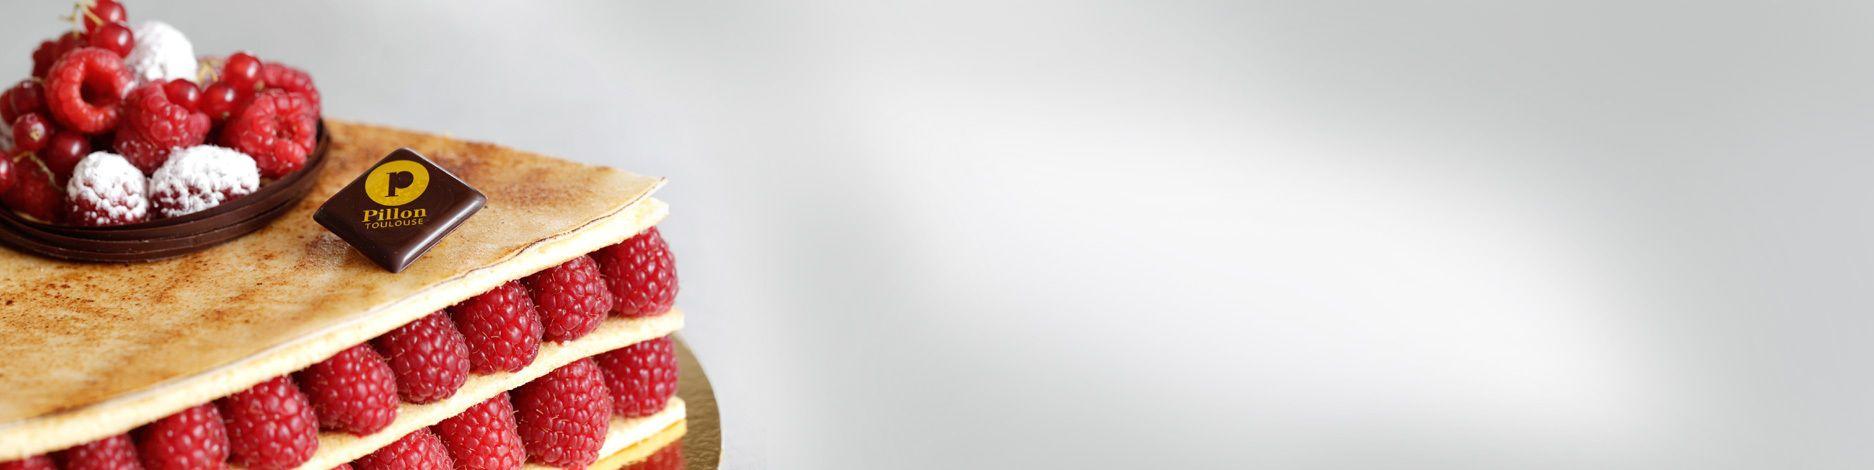 Framboisiers pistache